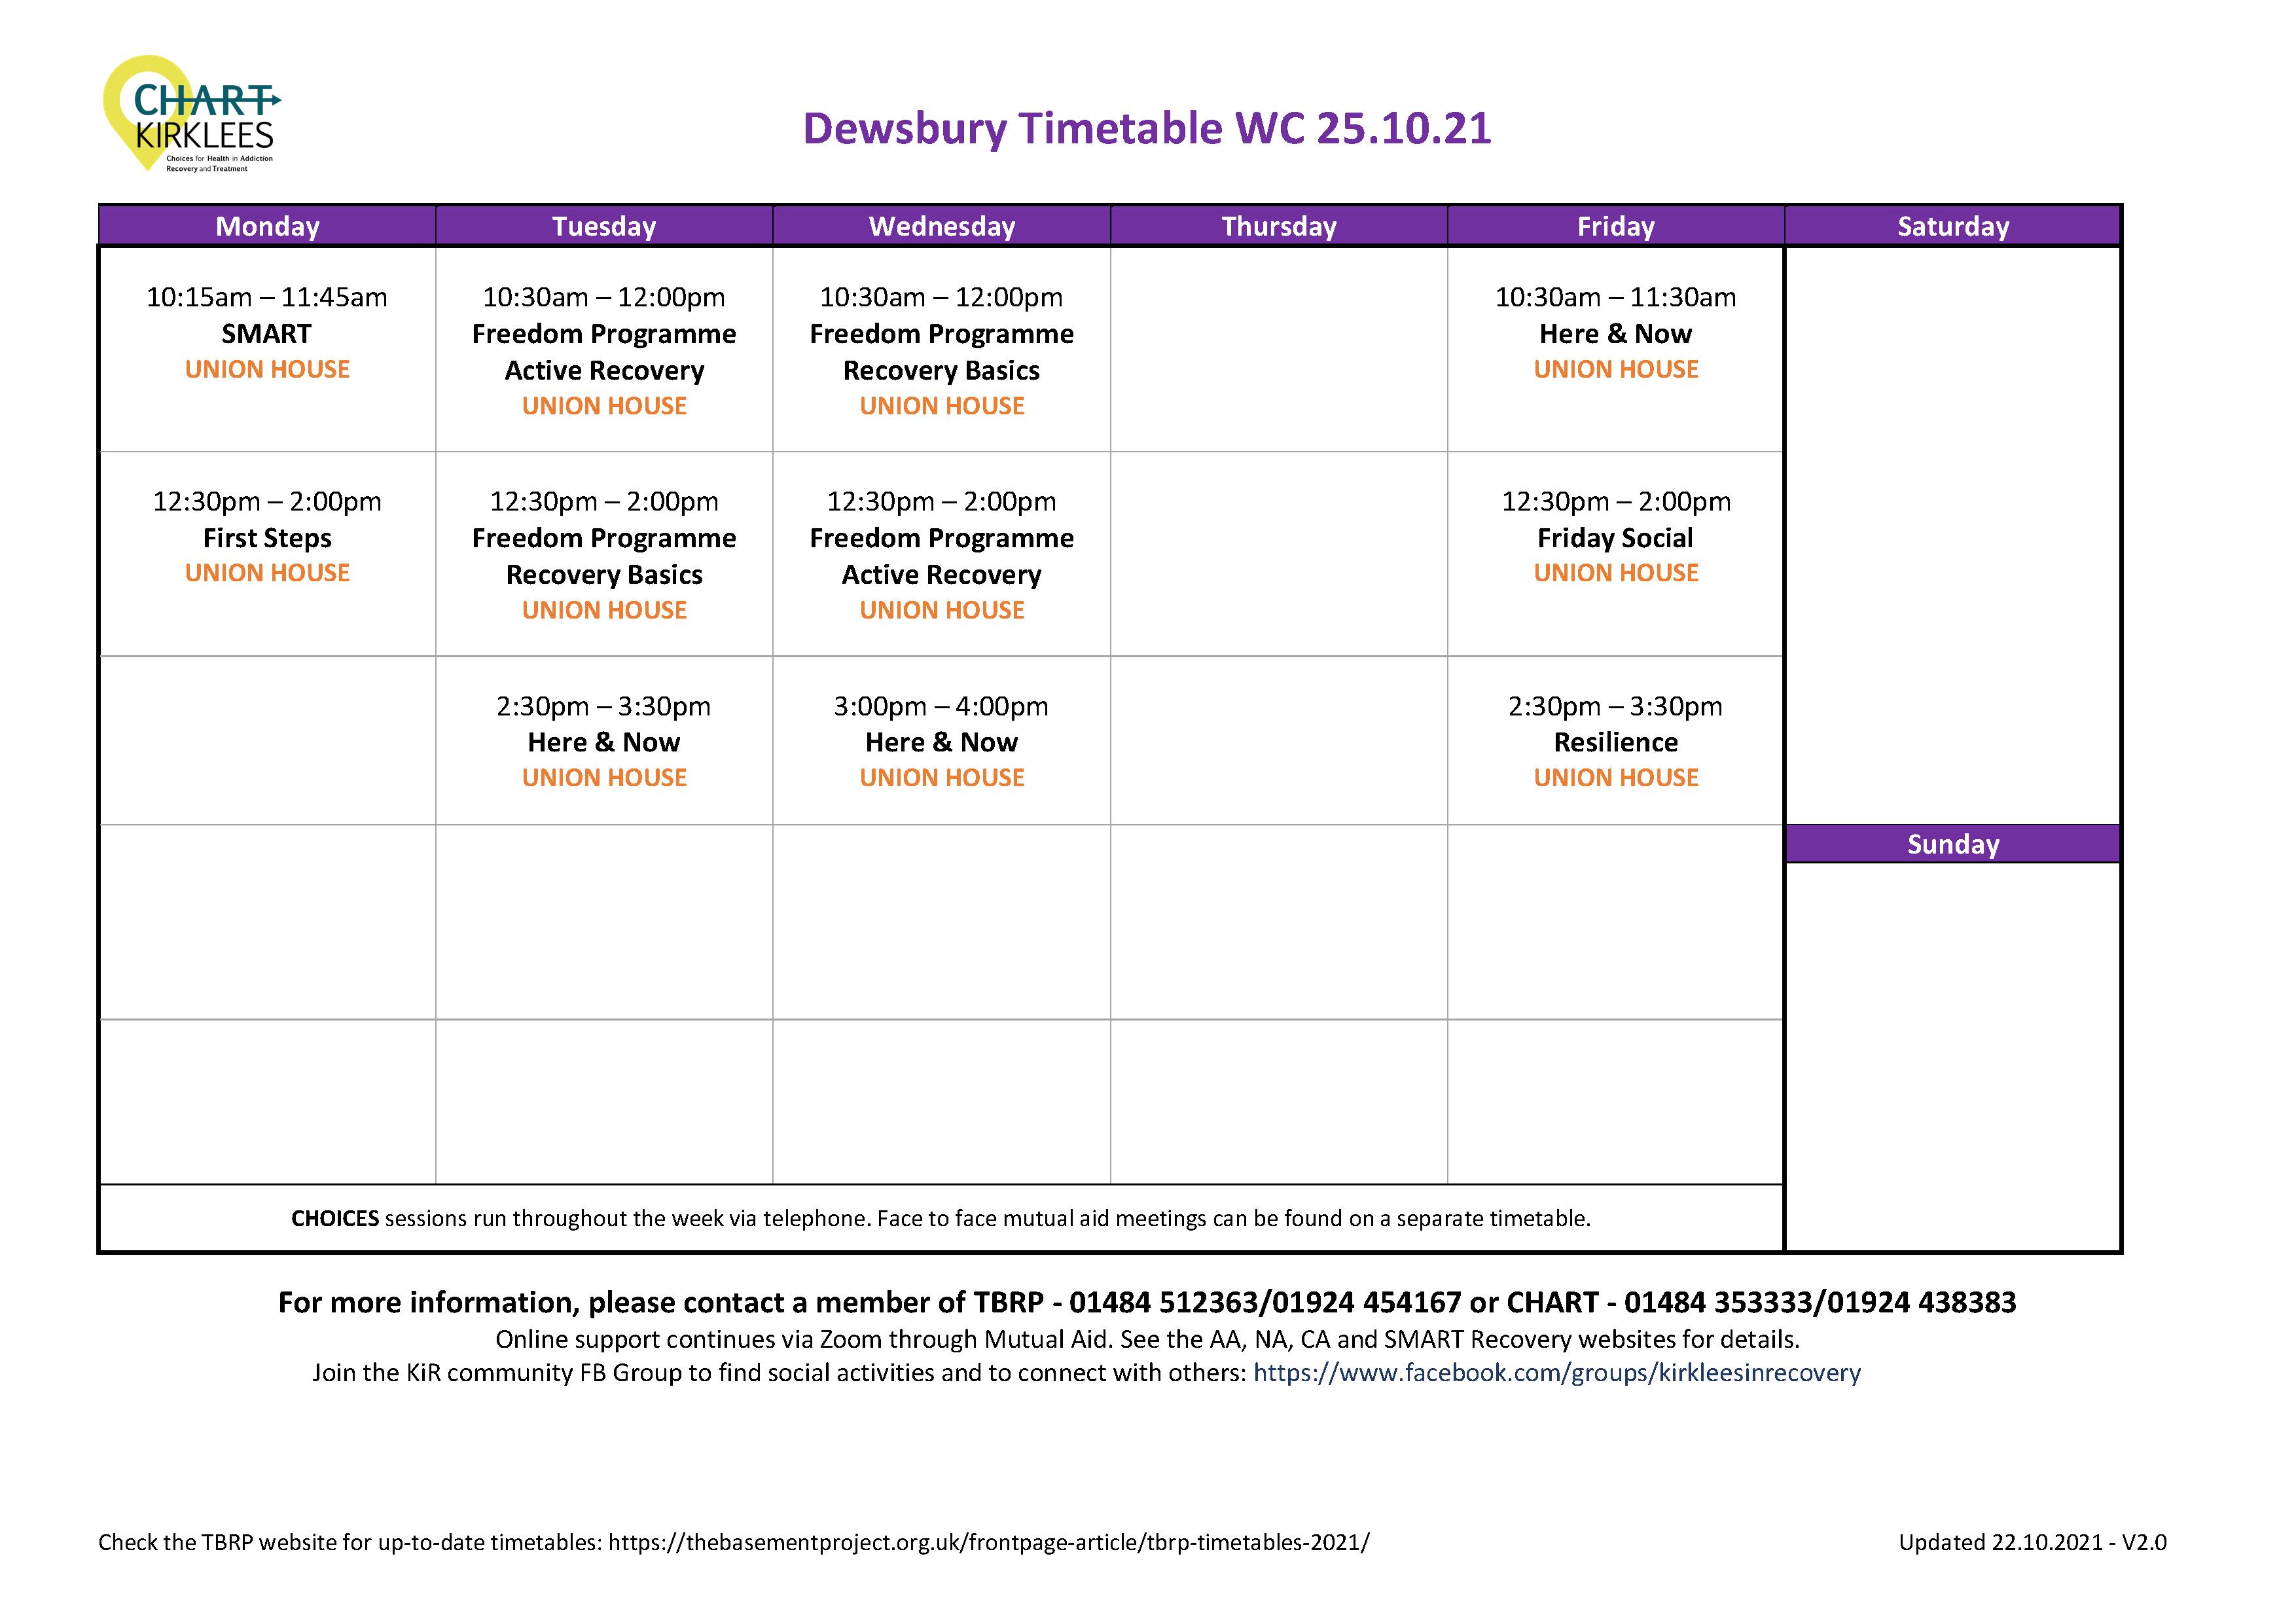 CHART Dewsbury Timetable